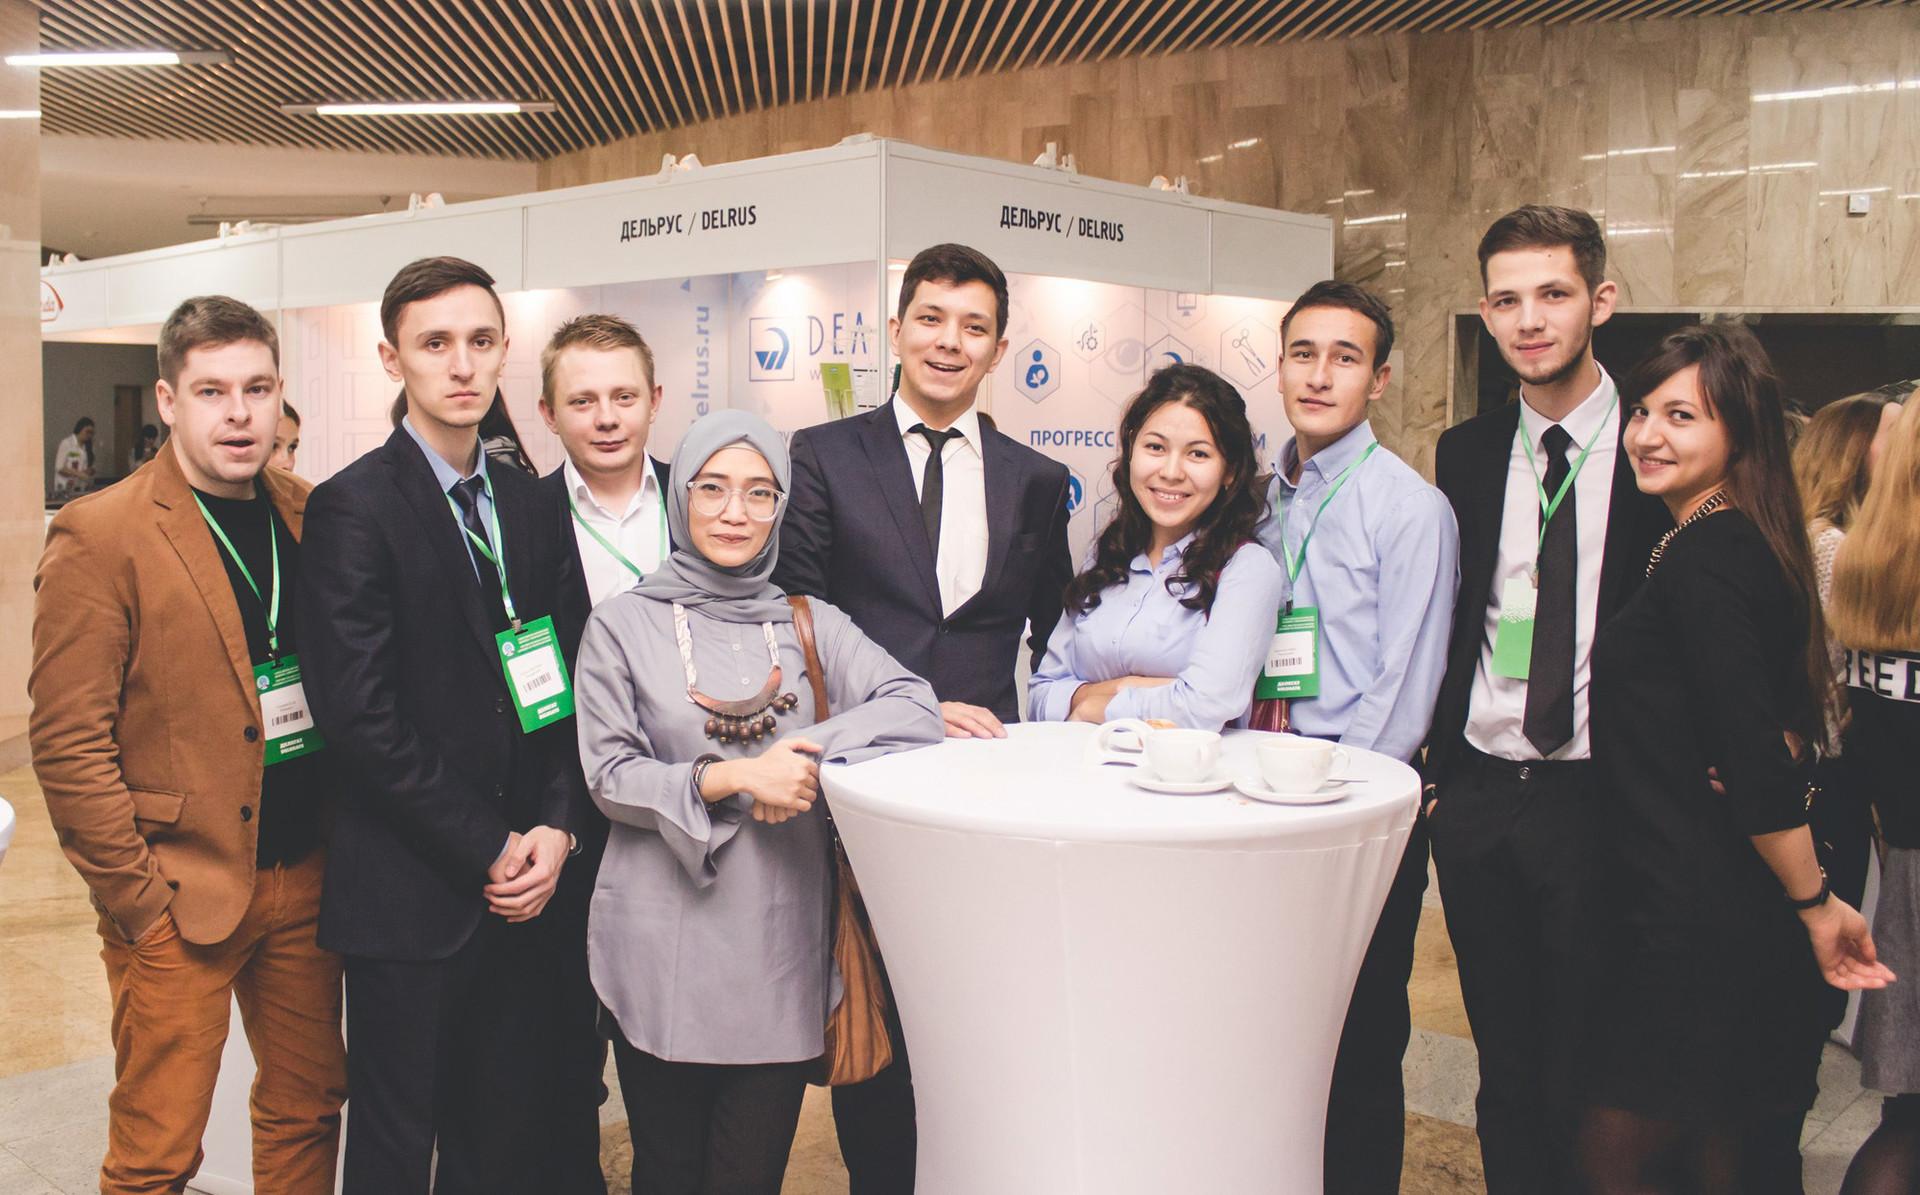 Sarah Edna Fadilah Ramadhani (keempat dari kiri), berfoto bersama para kolega dokter bedah saraf di sela acara